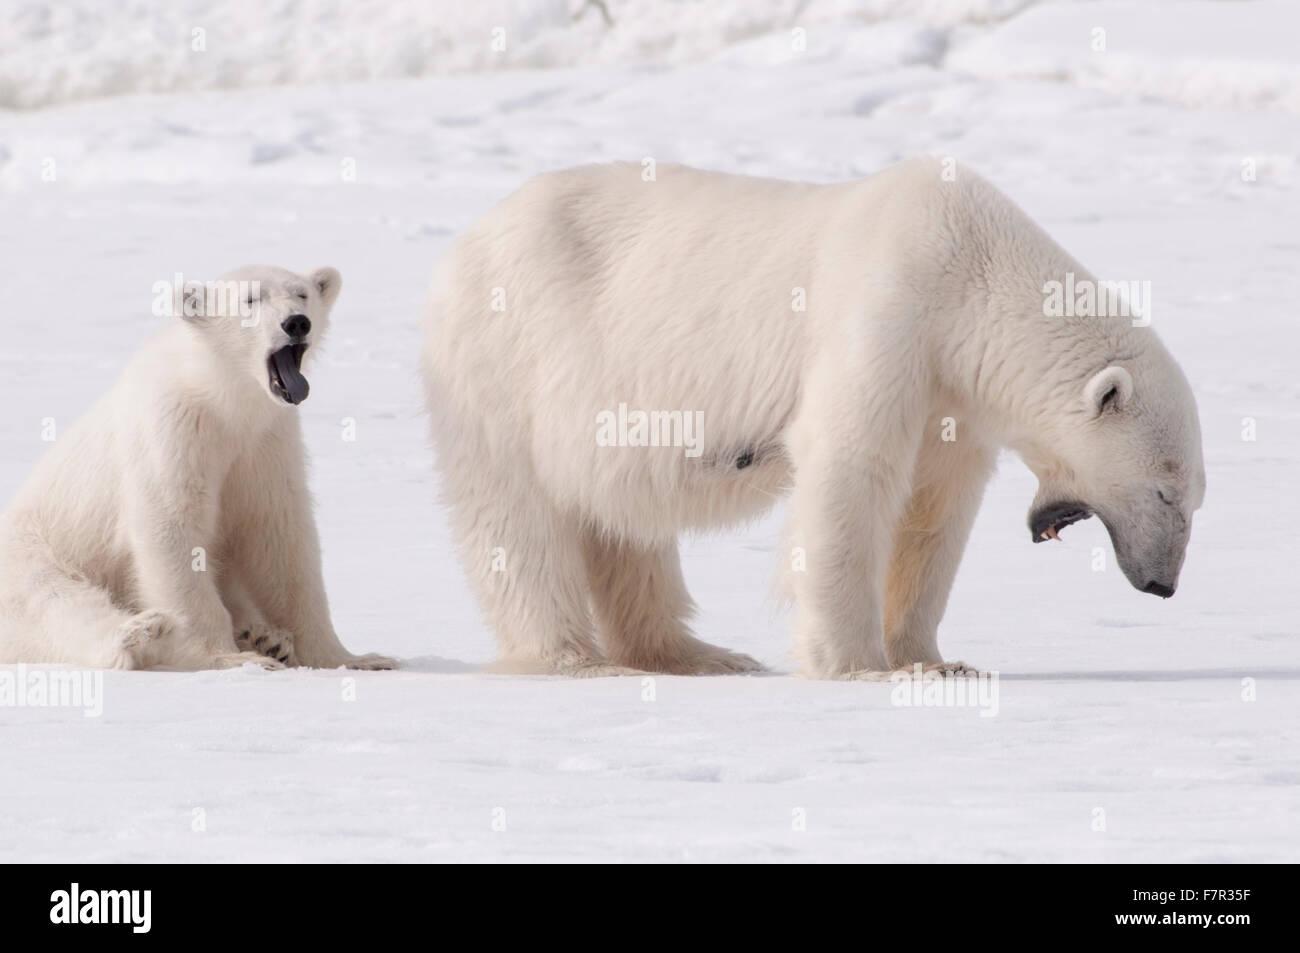 Wild Polar Bears (Ursus Maritimus), a Mother and Cub Yawning after eating at Sallyhamna, Svalbard - Stock Image